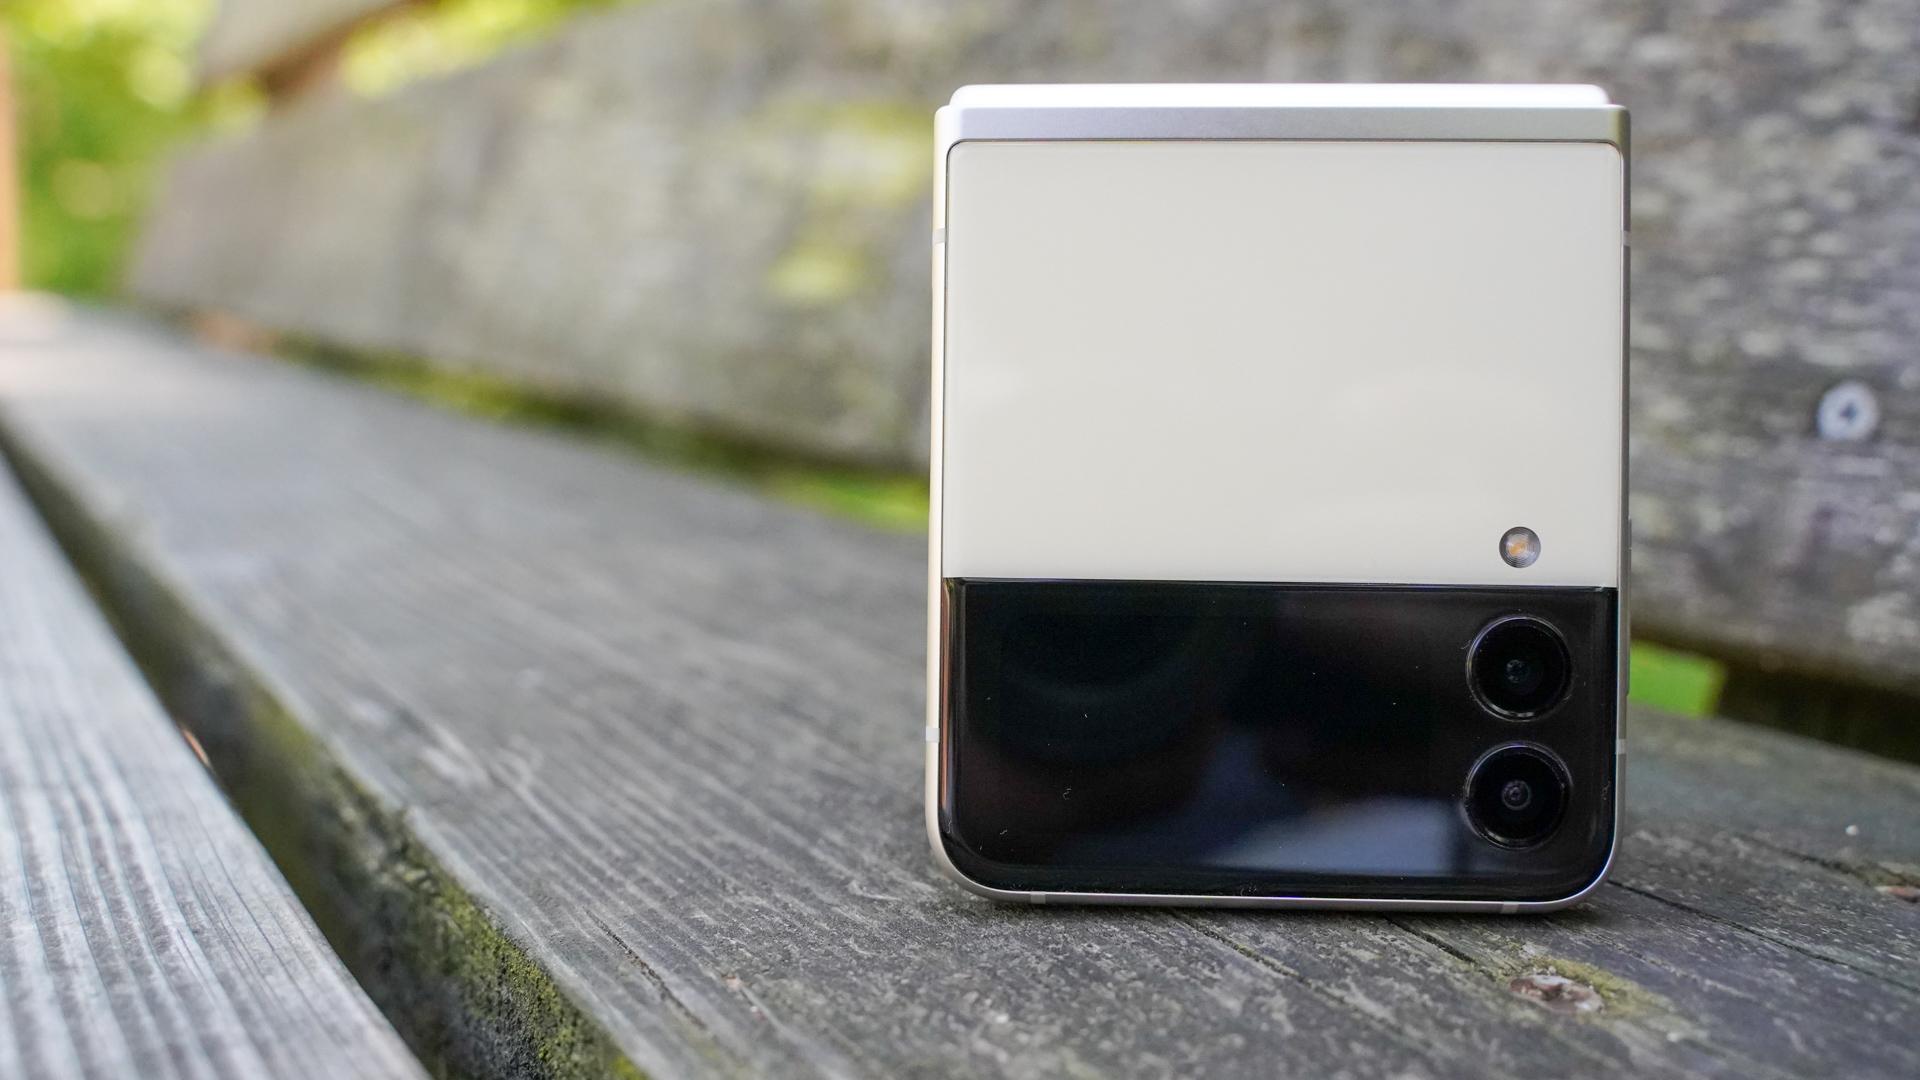 Samsung Galaxy Z Flip 3 closed on park bench